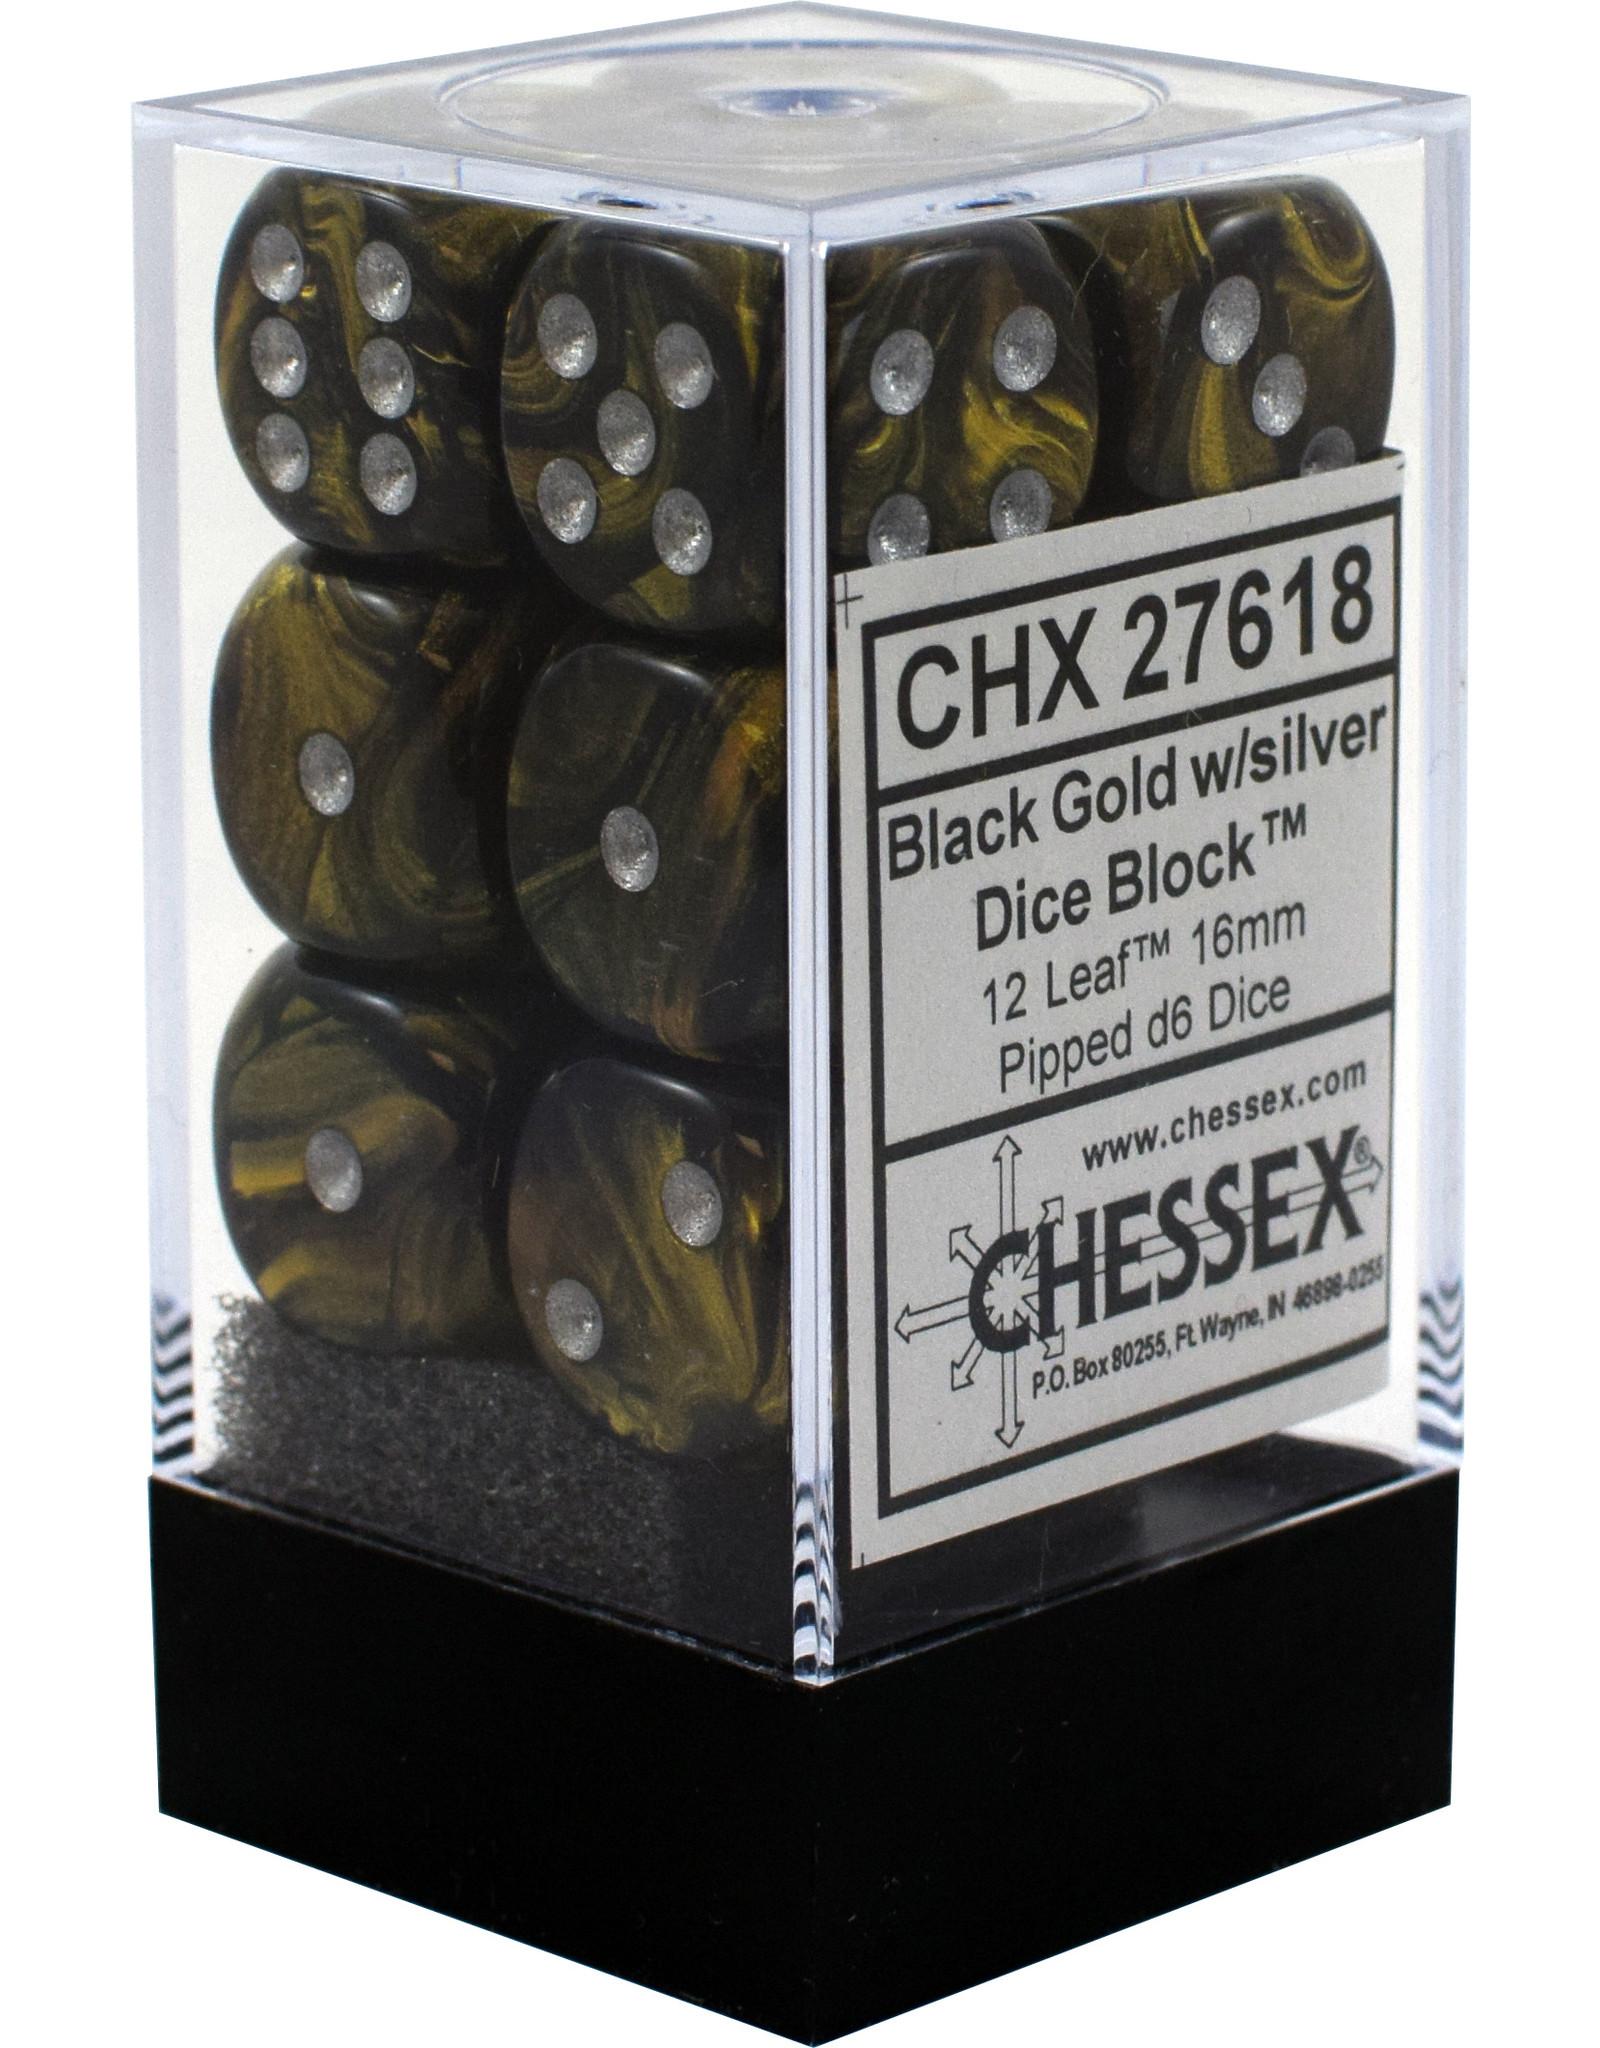 CHESSEX CHX 27618 16MM D6 DICE BLOCK LEAF BLACK GOLD W/SILVER